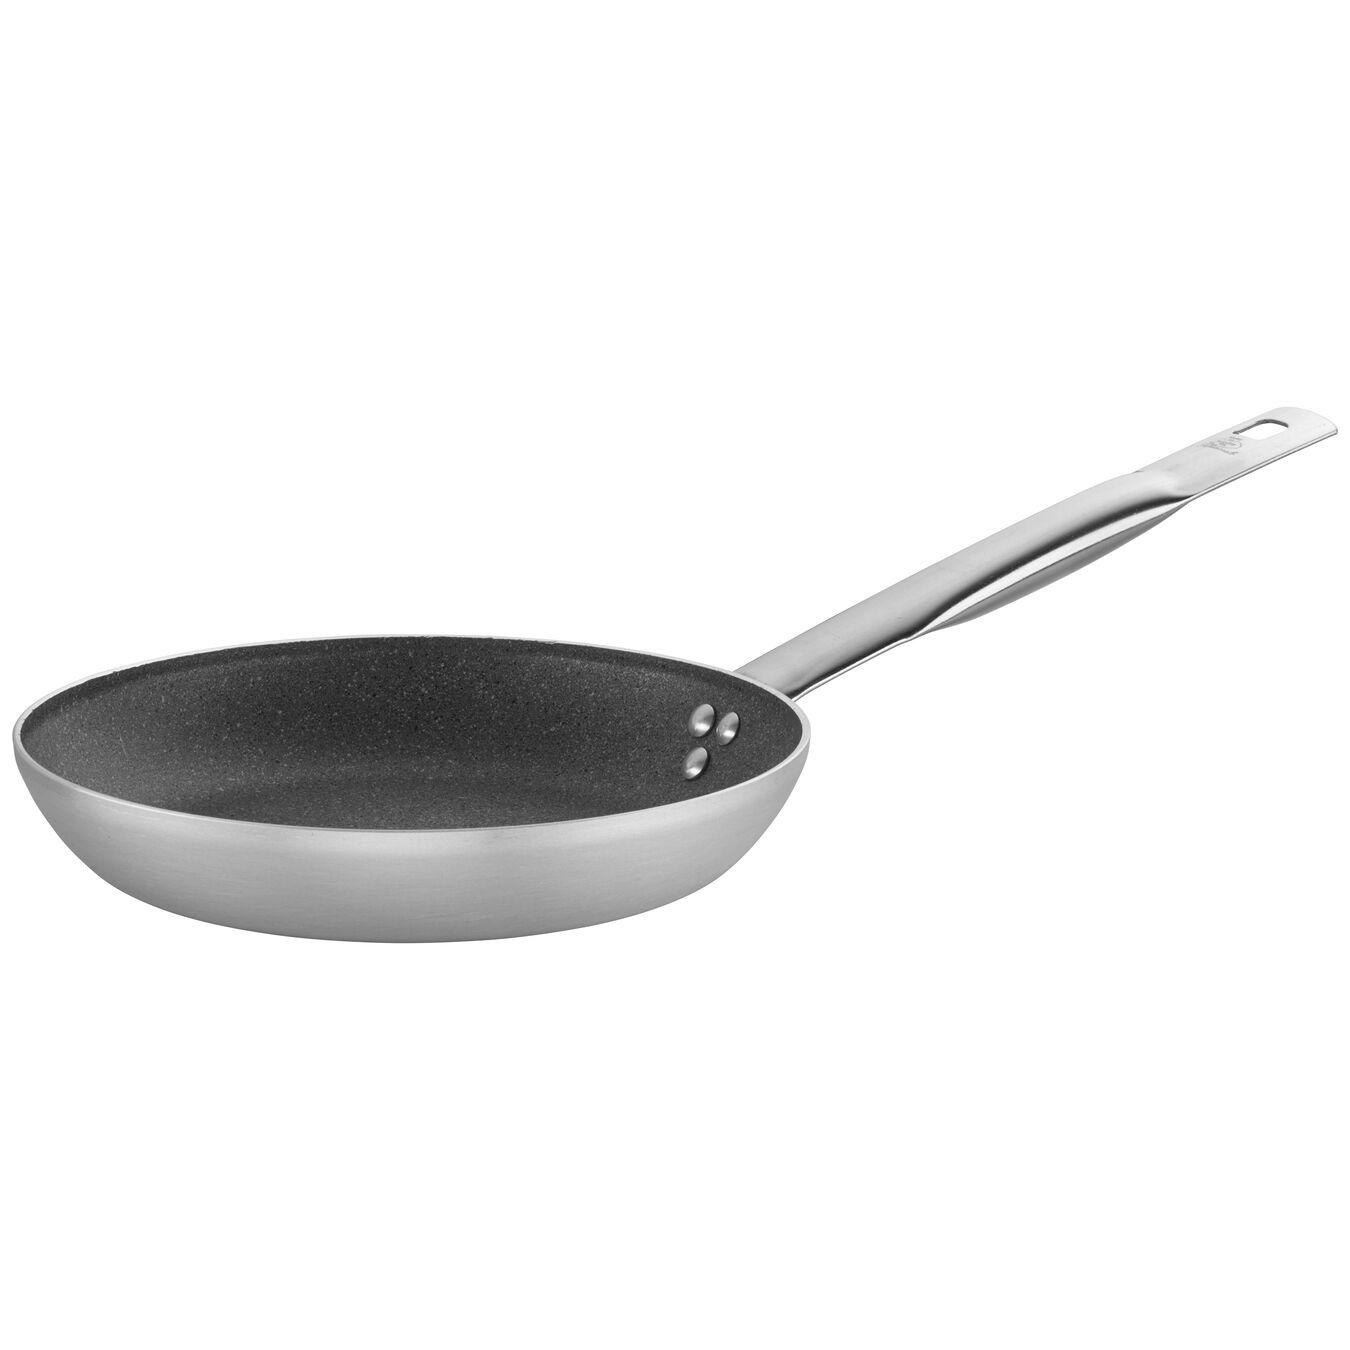 9.5-inch Fry Pan,,large 1